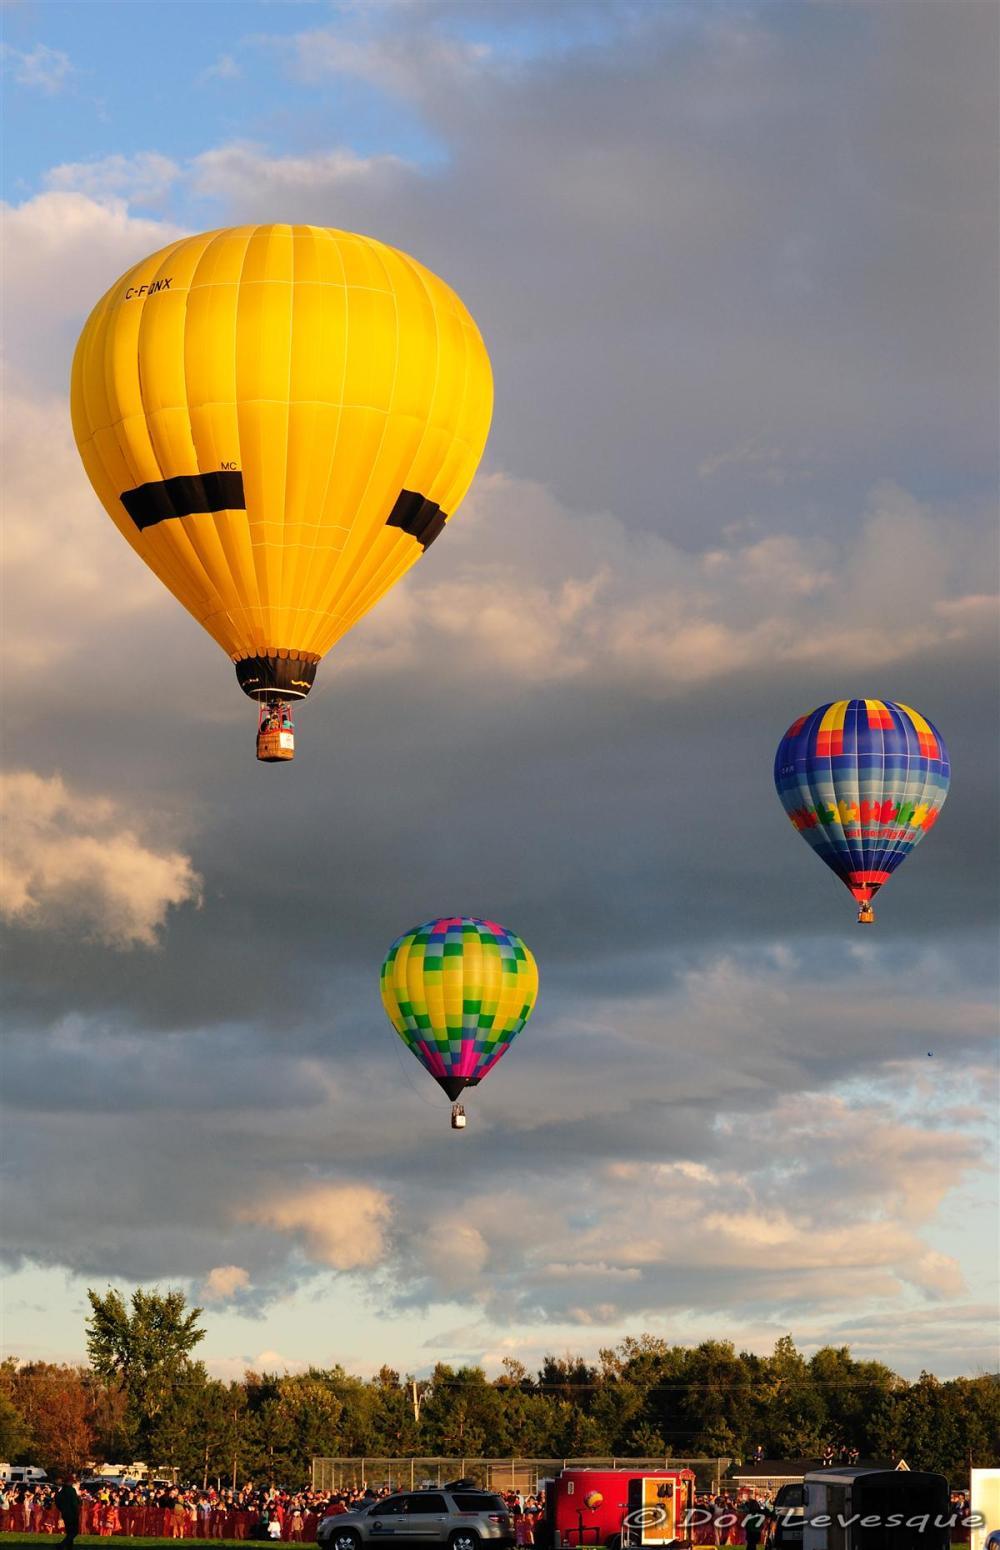 The Last Balloons